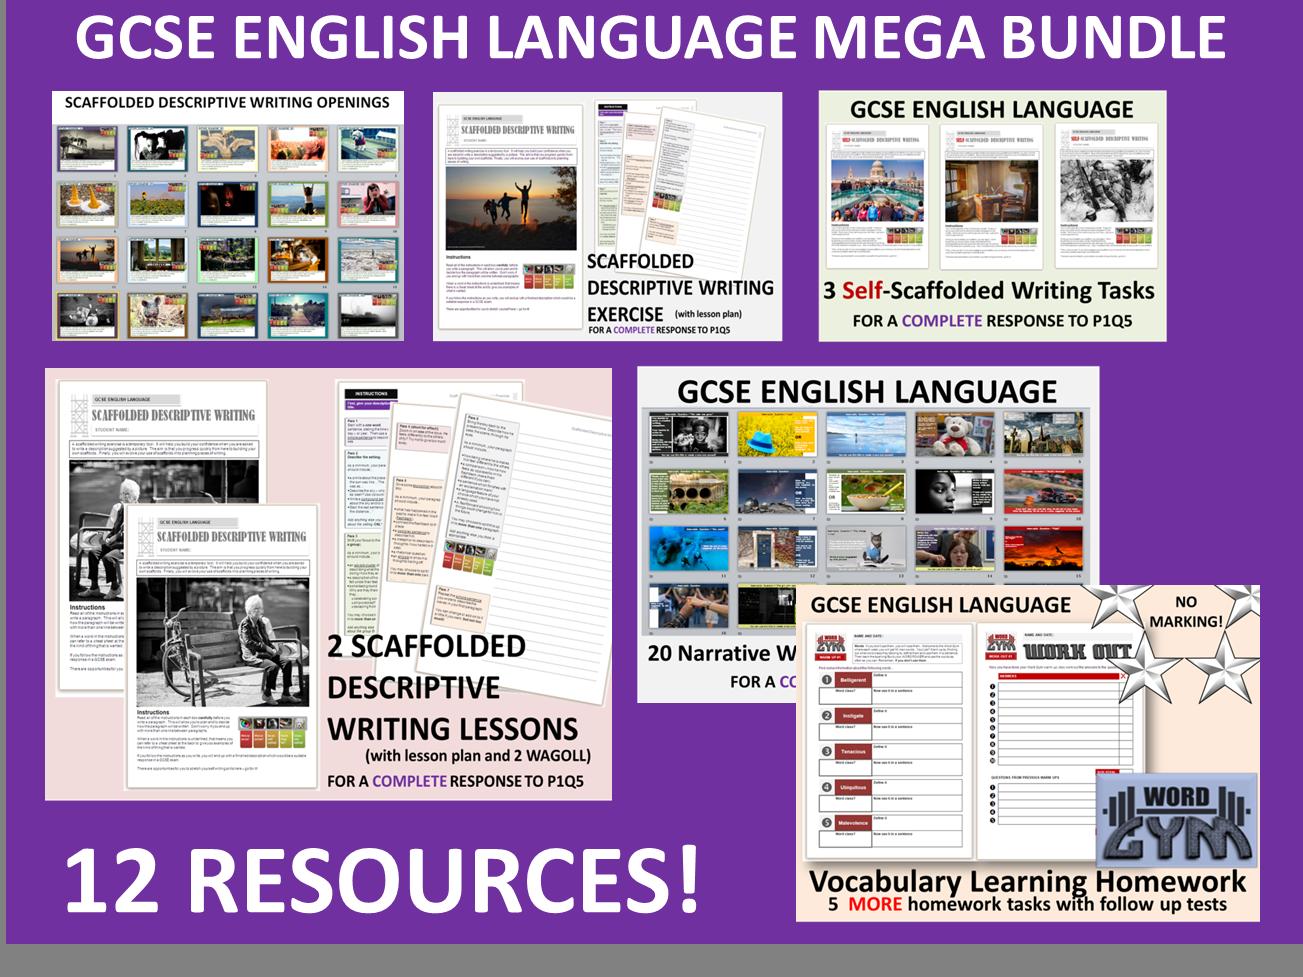 GCSE English Grade 9-1 Paper 1 Resources MEGA BUNDLE